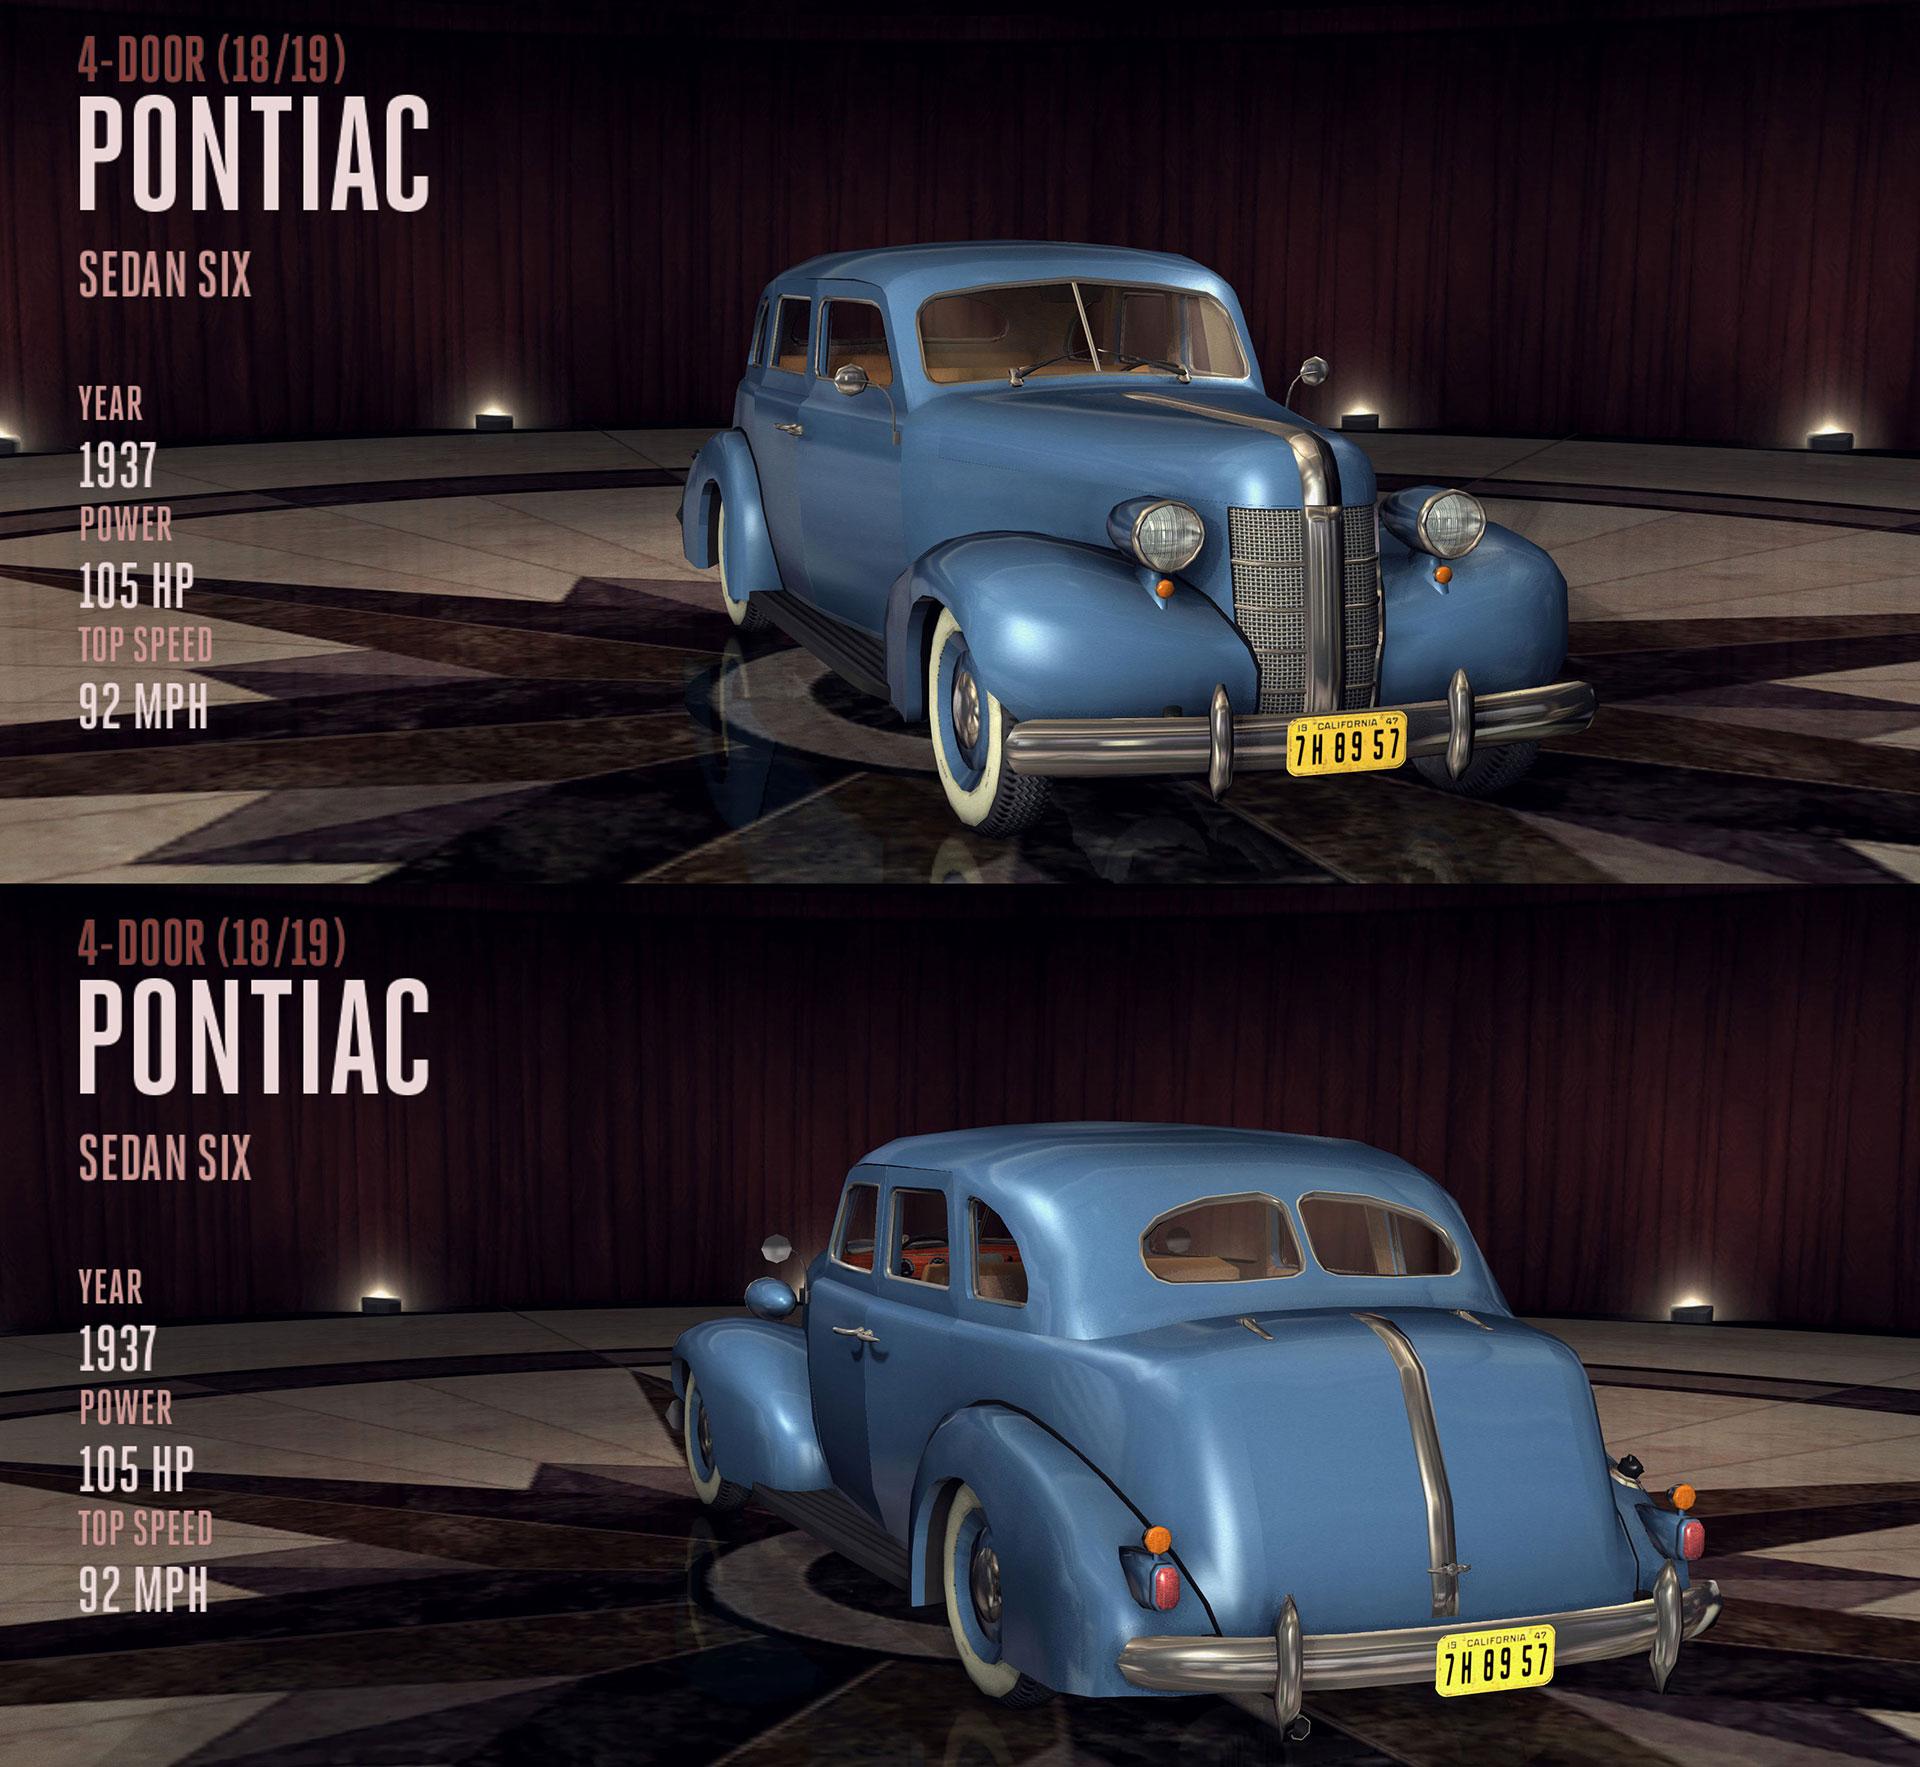 Pontiac Sedan Six